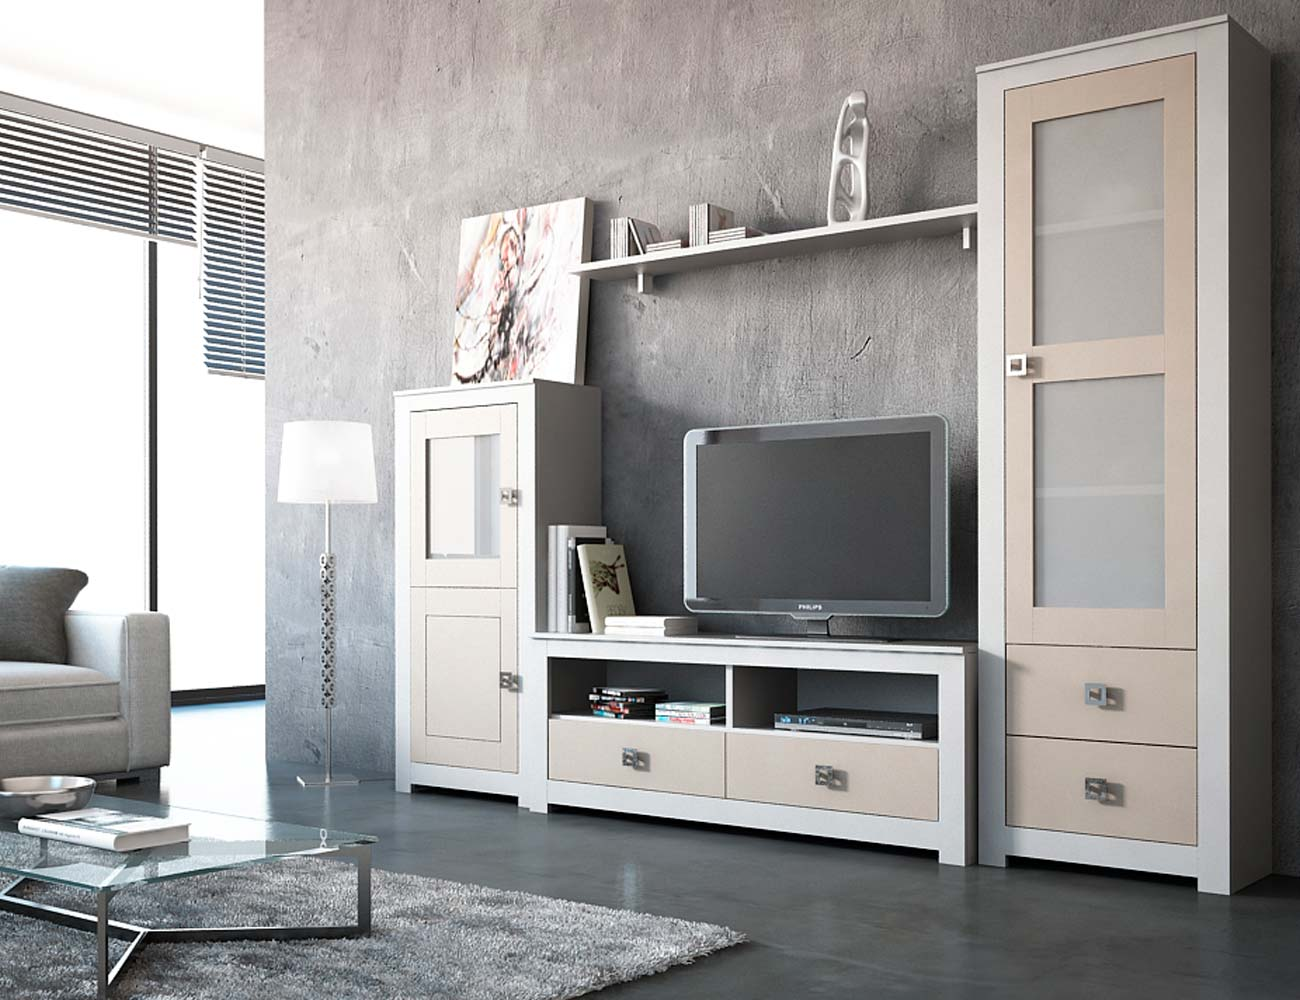 2 mueble salon modular lacado blanco piedra madera dm2